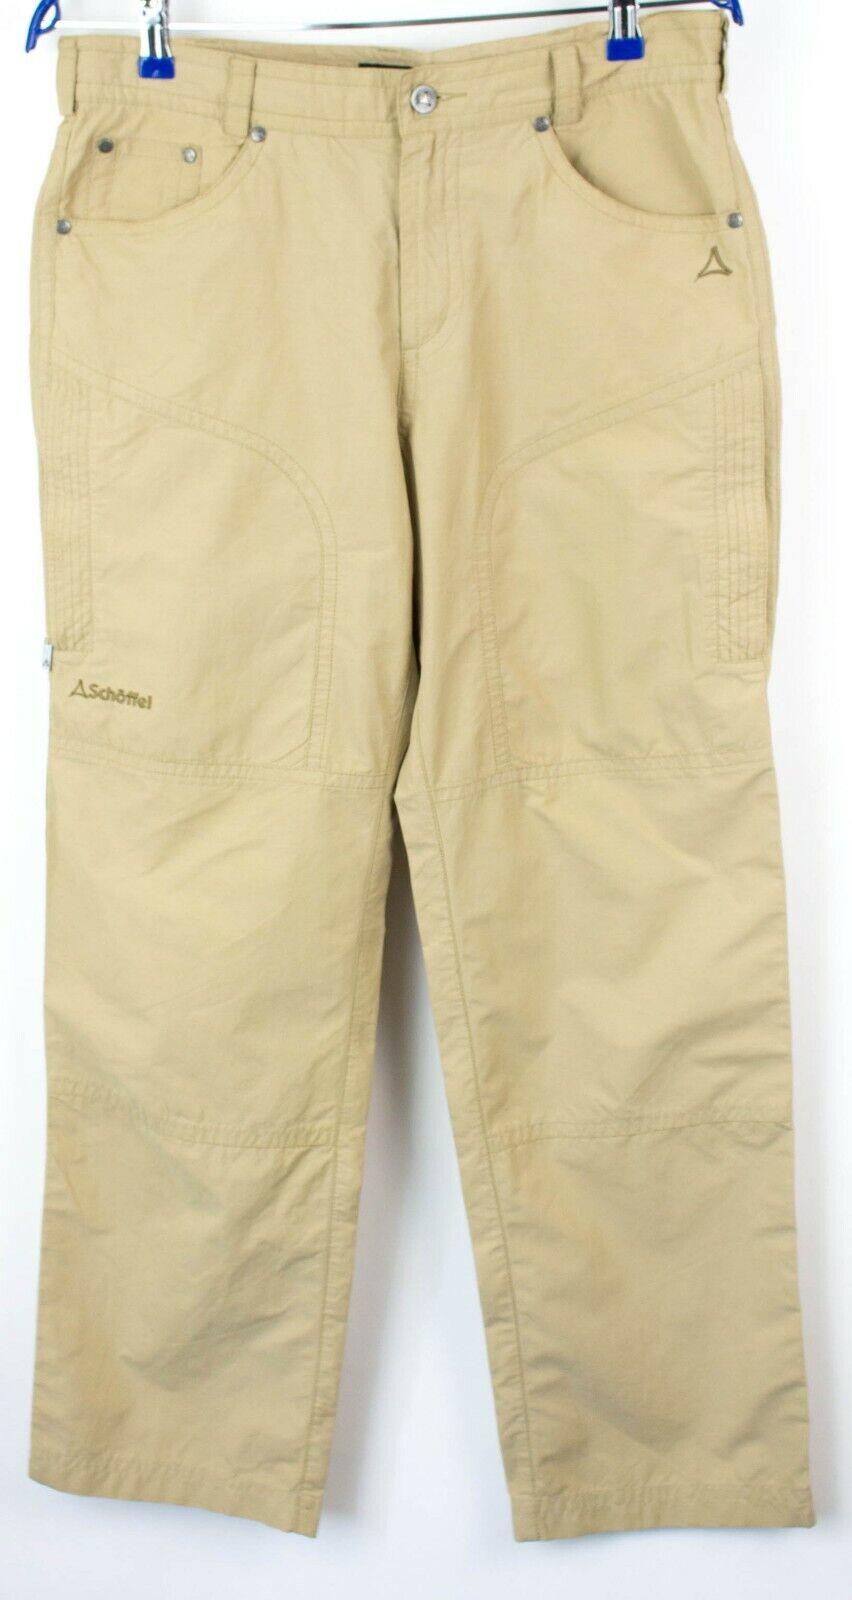 SCHOFFEL Men Matek Outdoor Trousers Pants Size 48 (W33 L30) NZ129